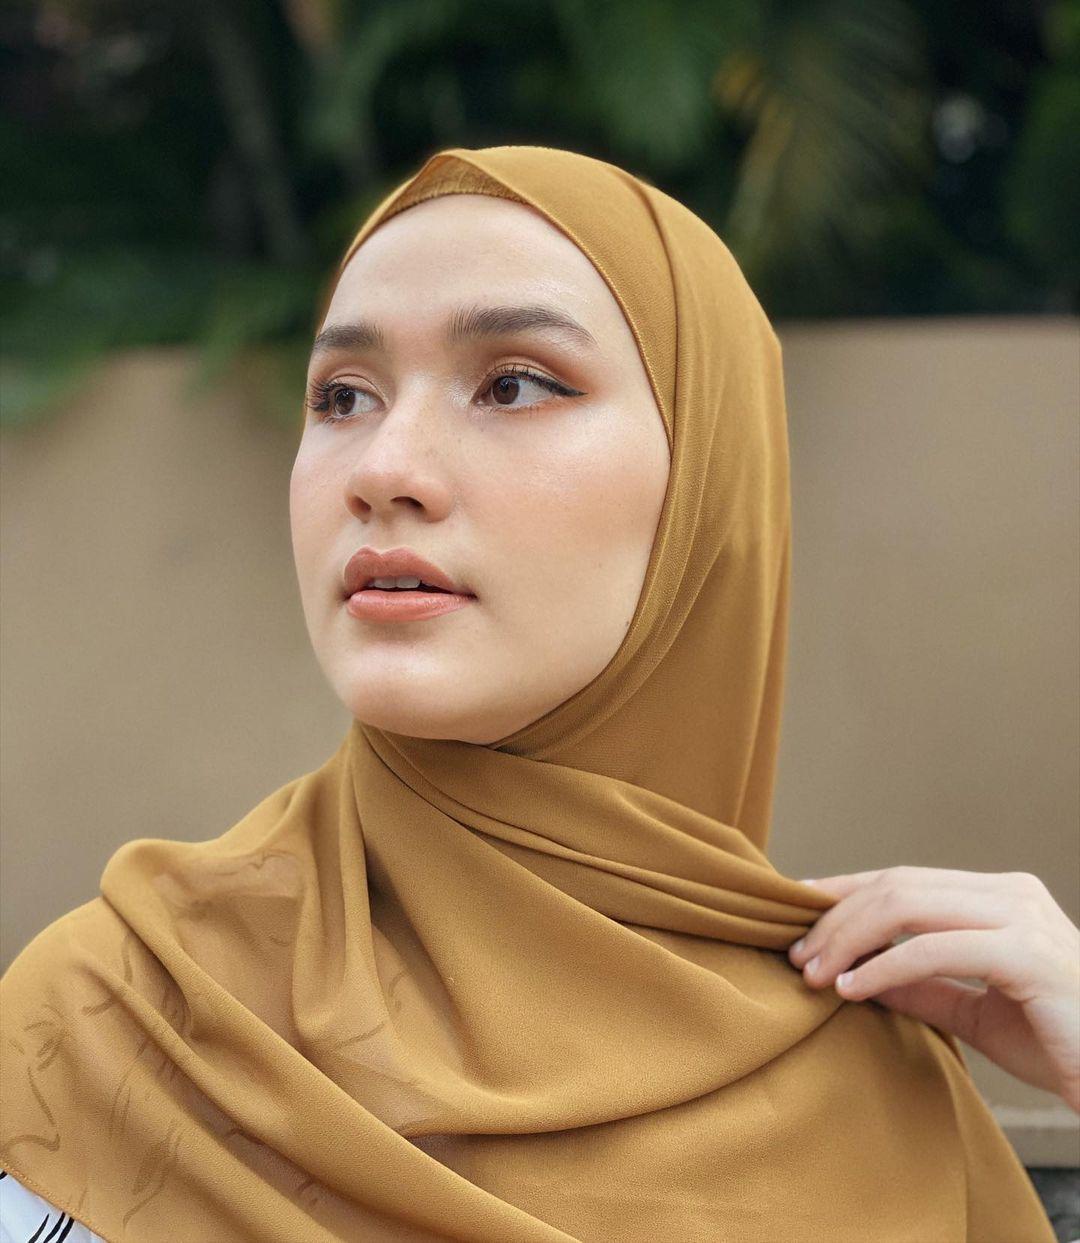 Warna Hijab yang Cocok untuk Kulit Kuning Langsat